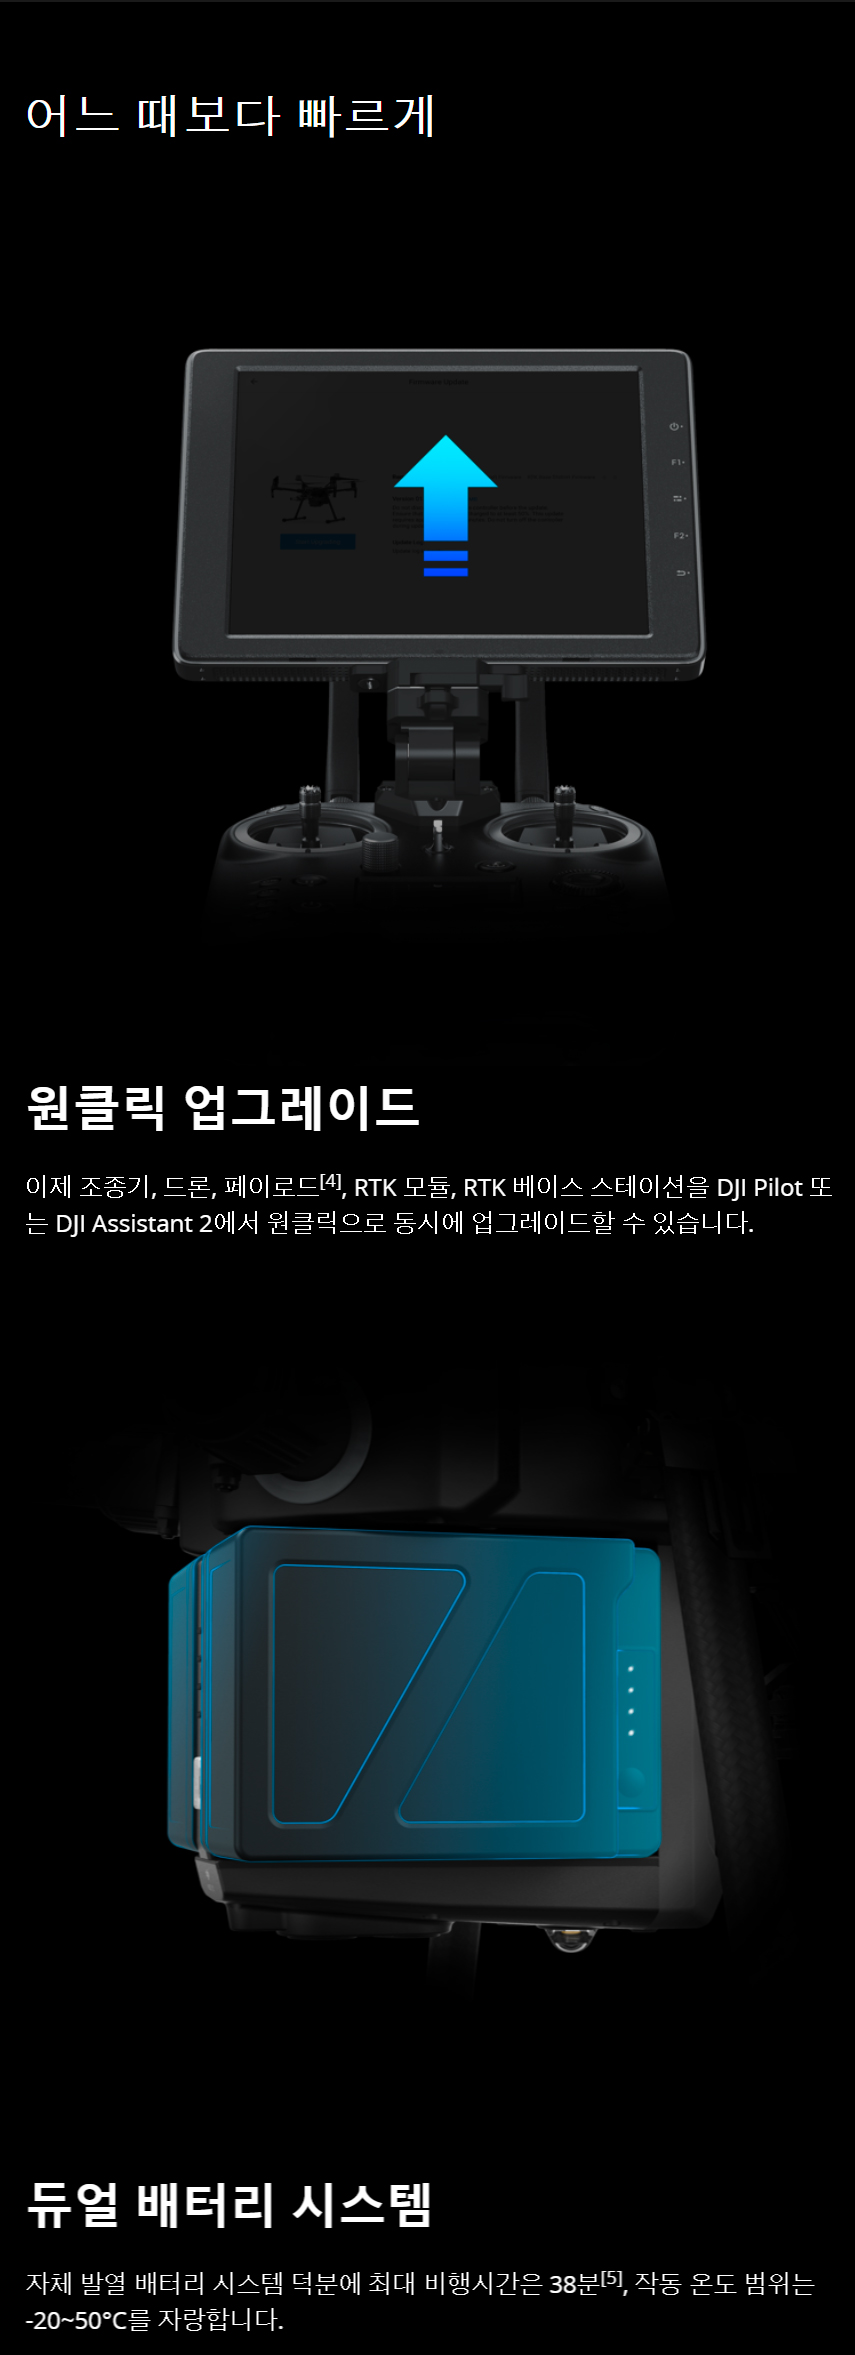 DJI MATRICE 210 V2 매트리스 210 V2 드론 코세코